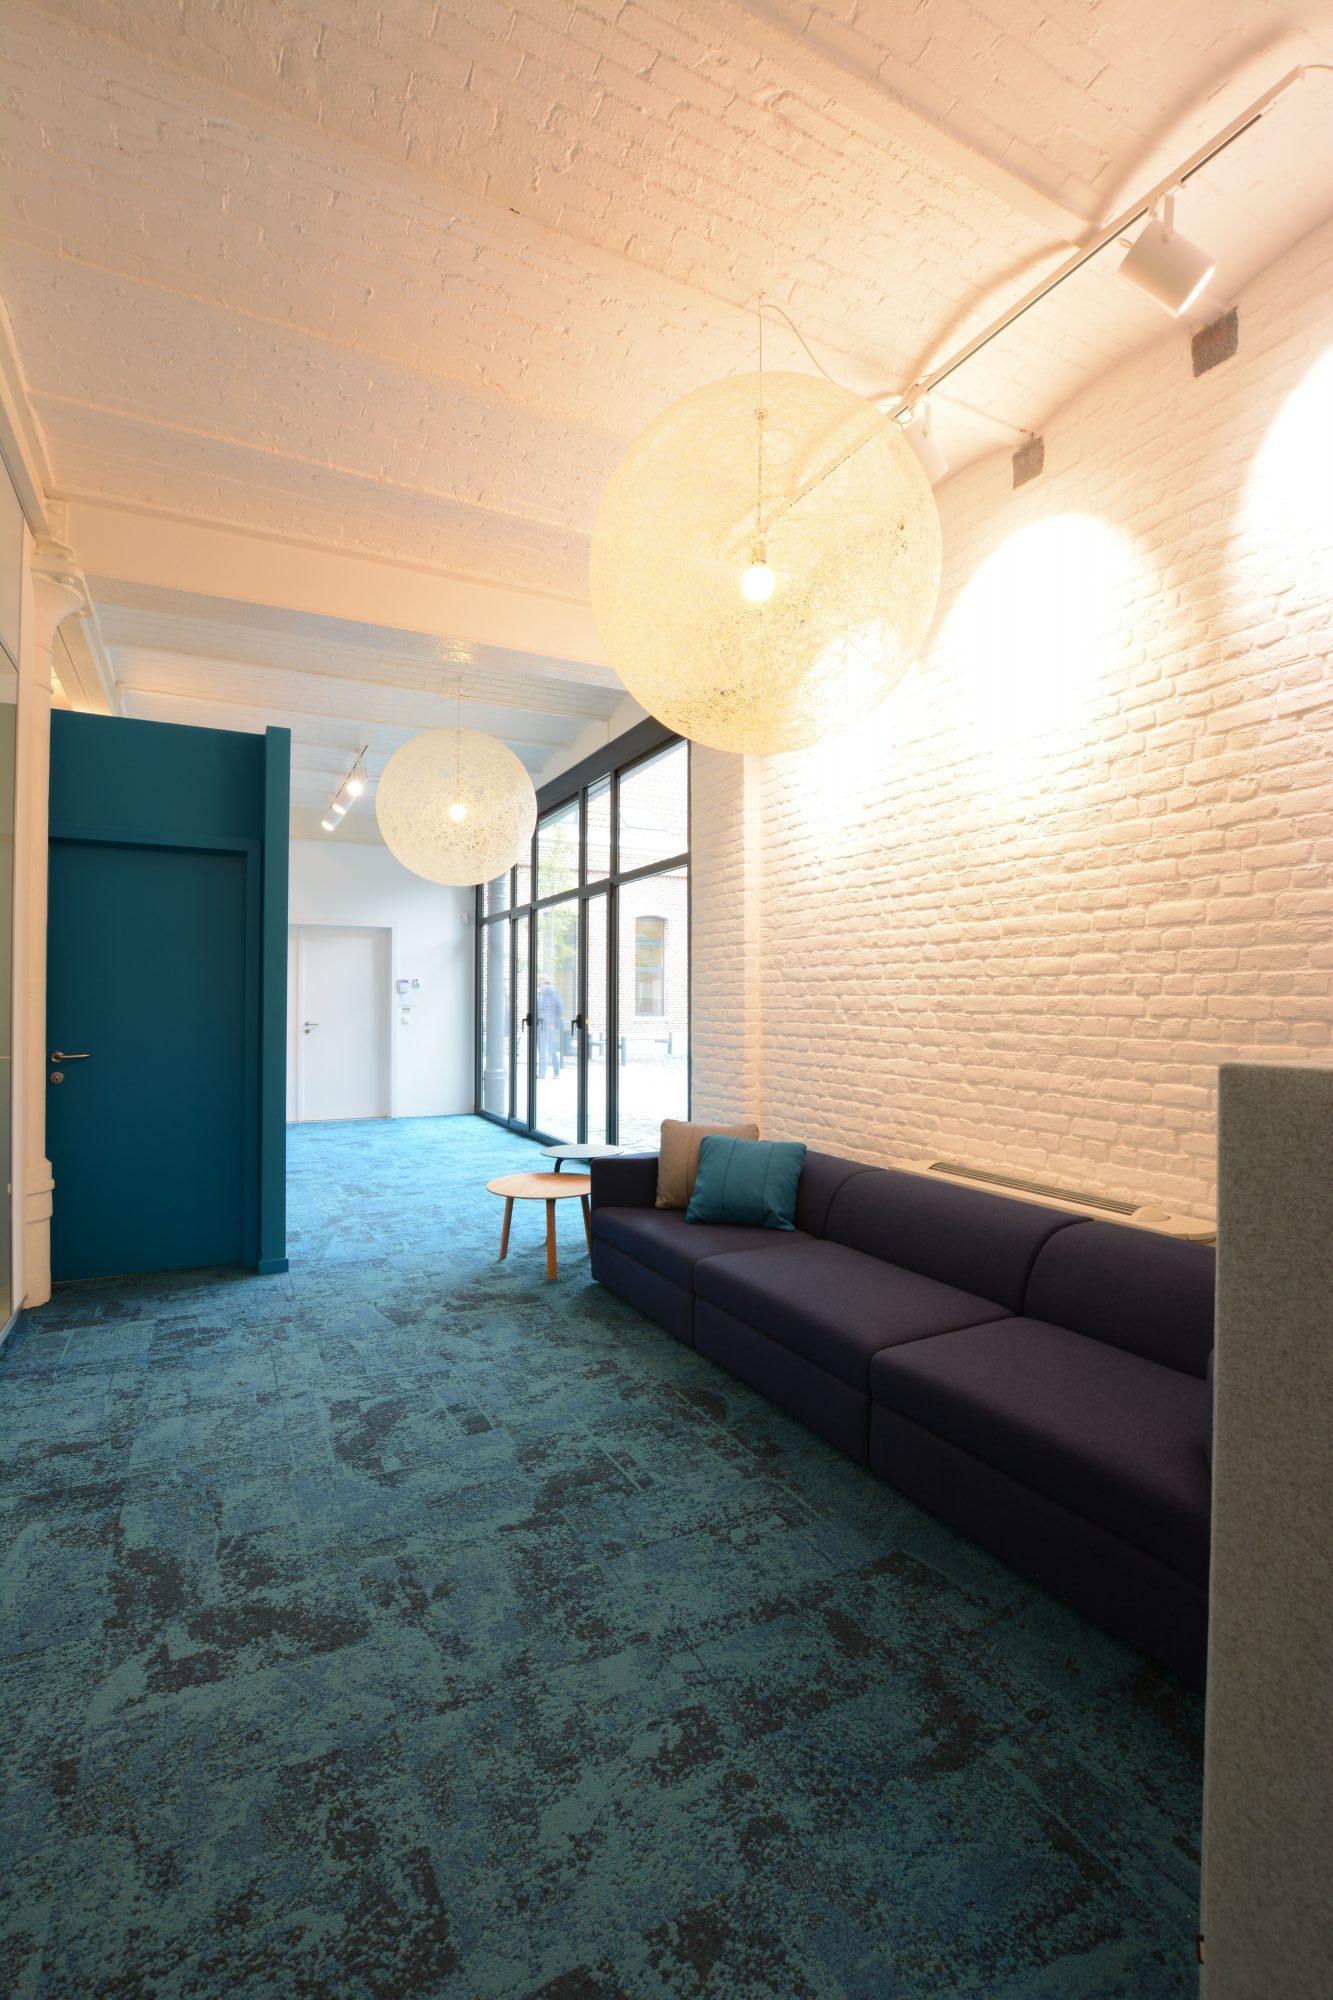 blauw tapijt, blauwe mur, witte geschilderde bakstenen wand, verlichte hal